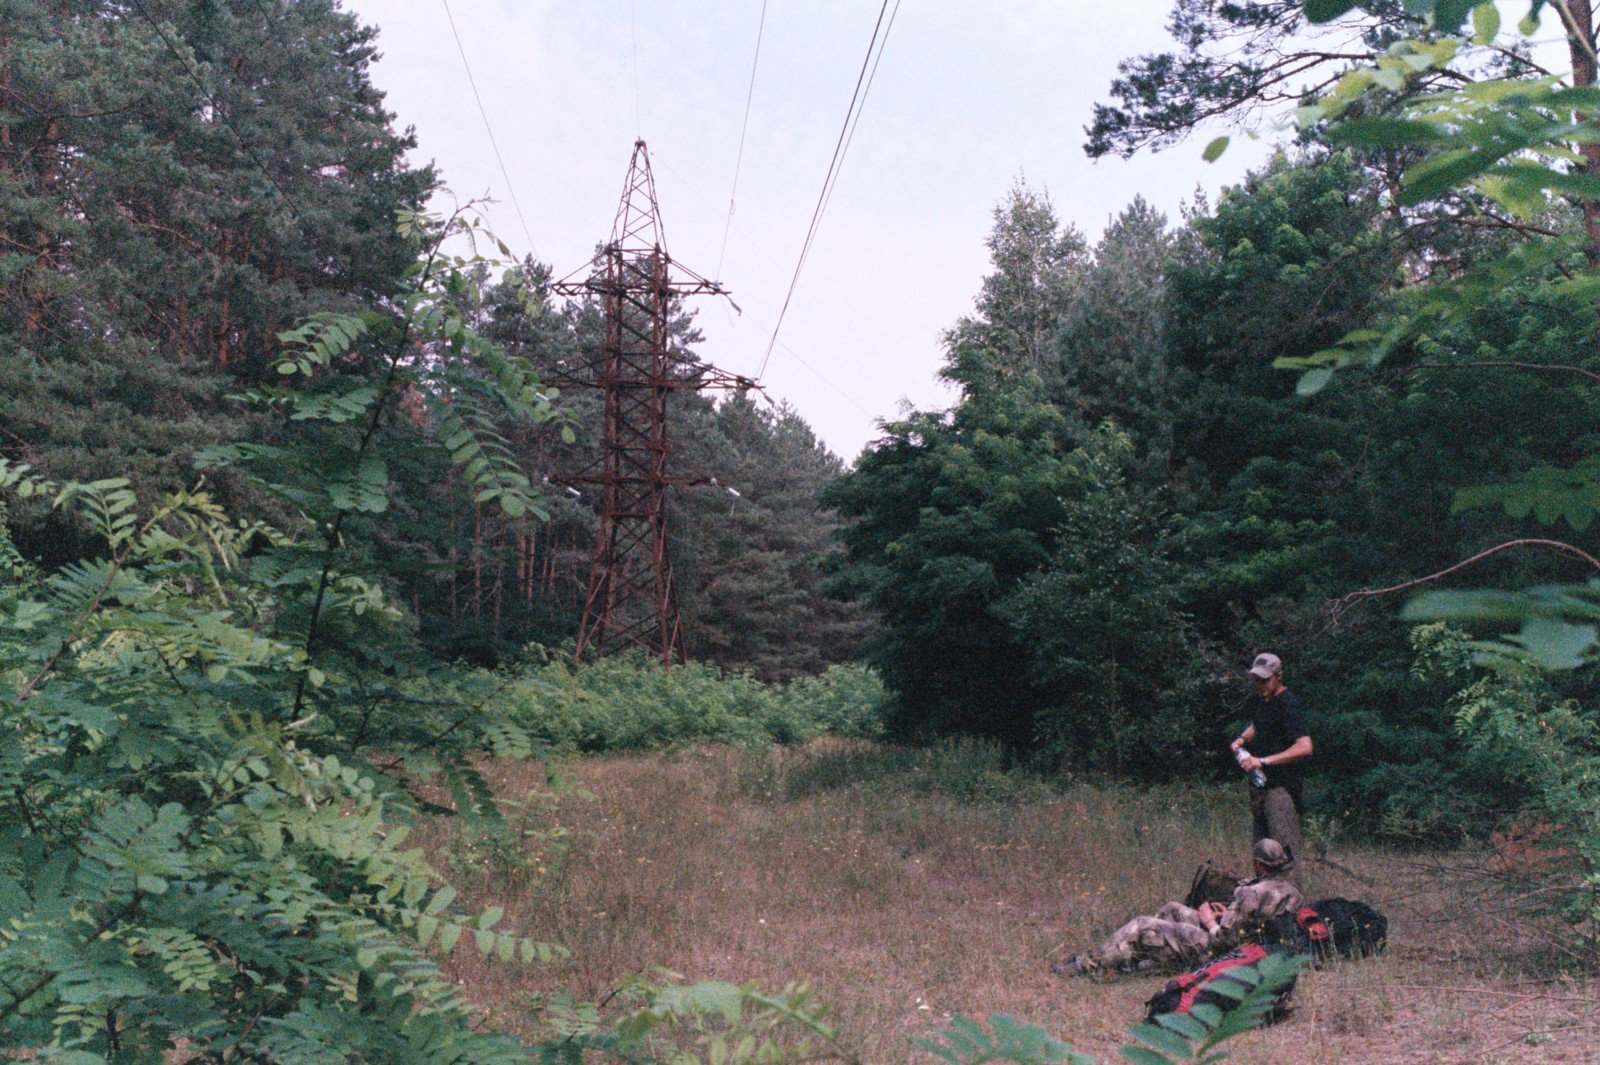 snaeking-into-chernobyl8 SNEAKING INTO CHERNOBYL